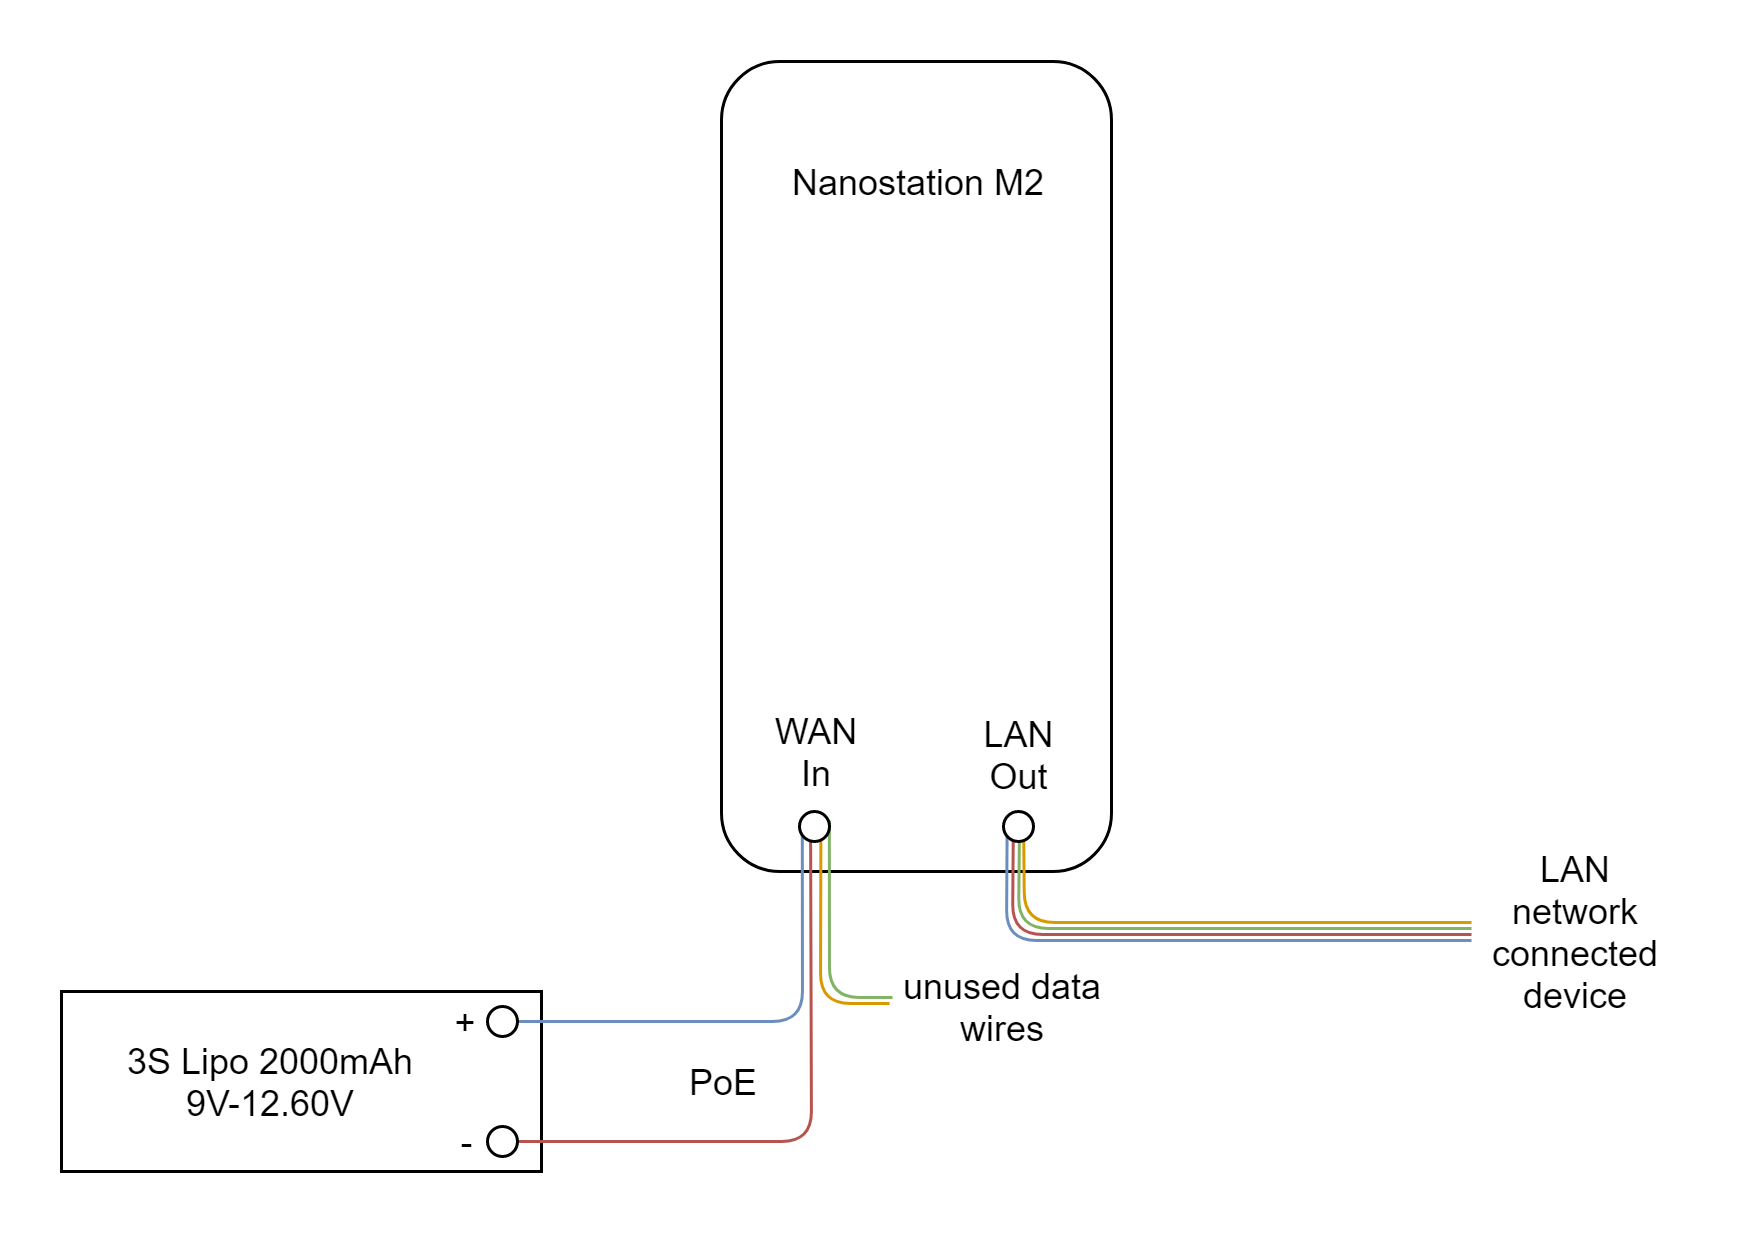 ubiquiti wiring diagram mk 1149  nanostation m2 wiring diagram schematic wiring  mk 1149  nanostation m2 wiring diagram